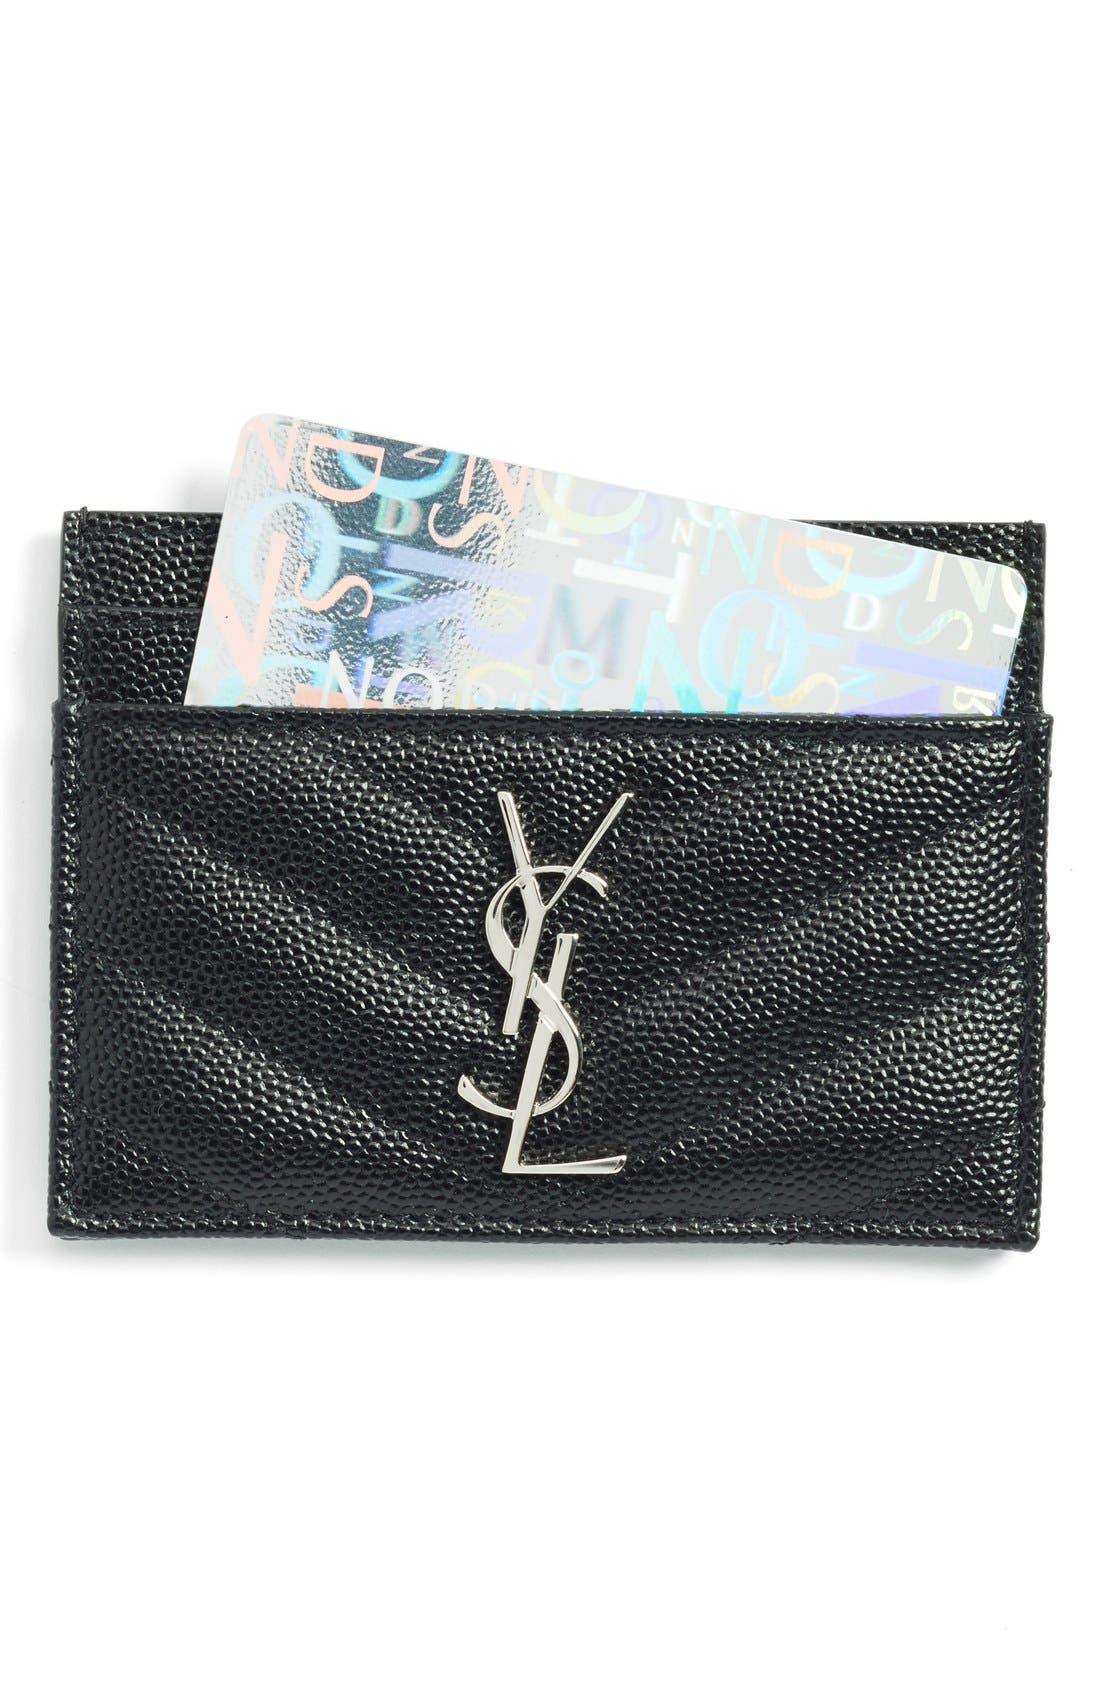 Alternate Image 1 Selected - Saint Laurent 'Monogram' Credit Card Case